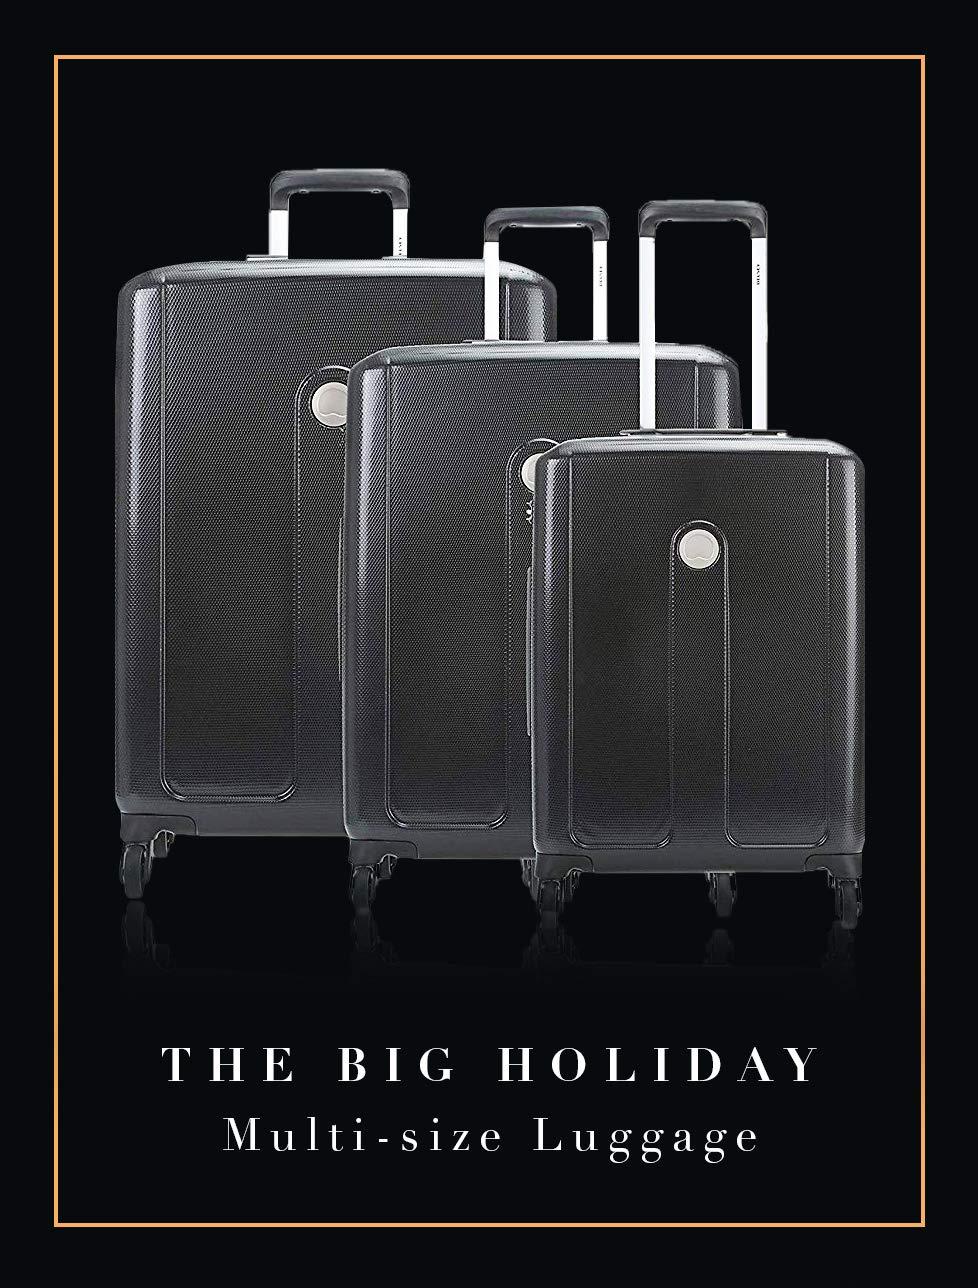 The Big Holiday